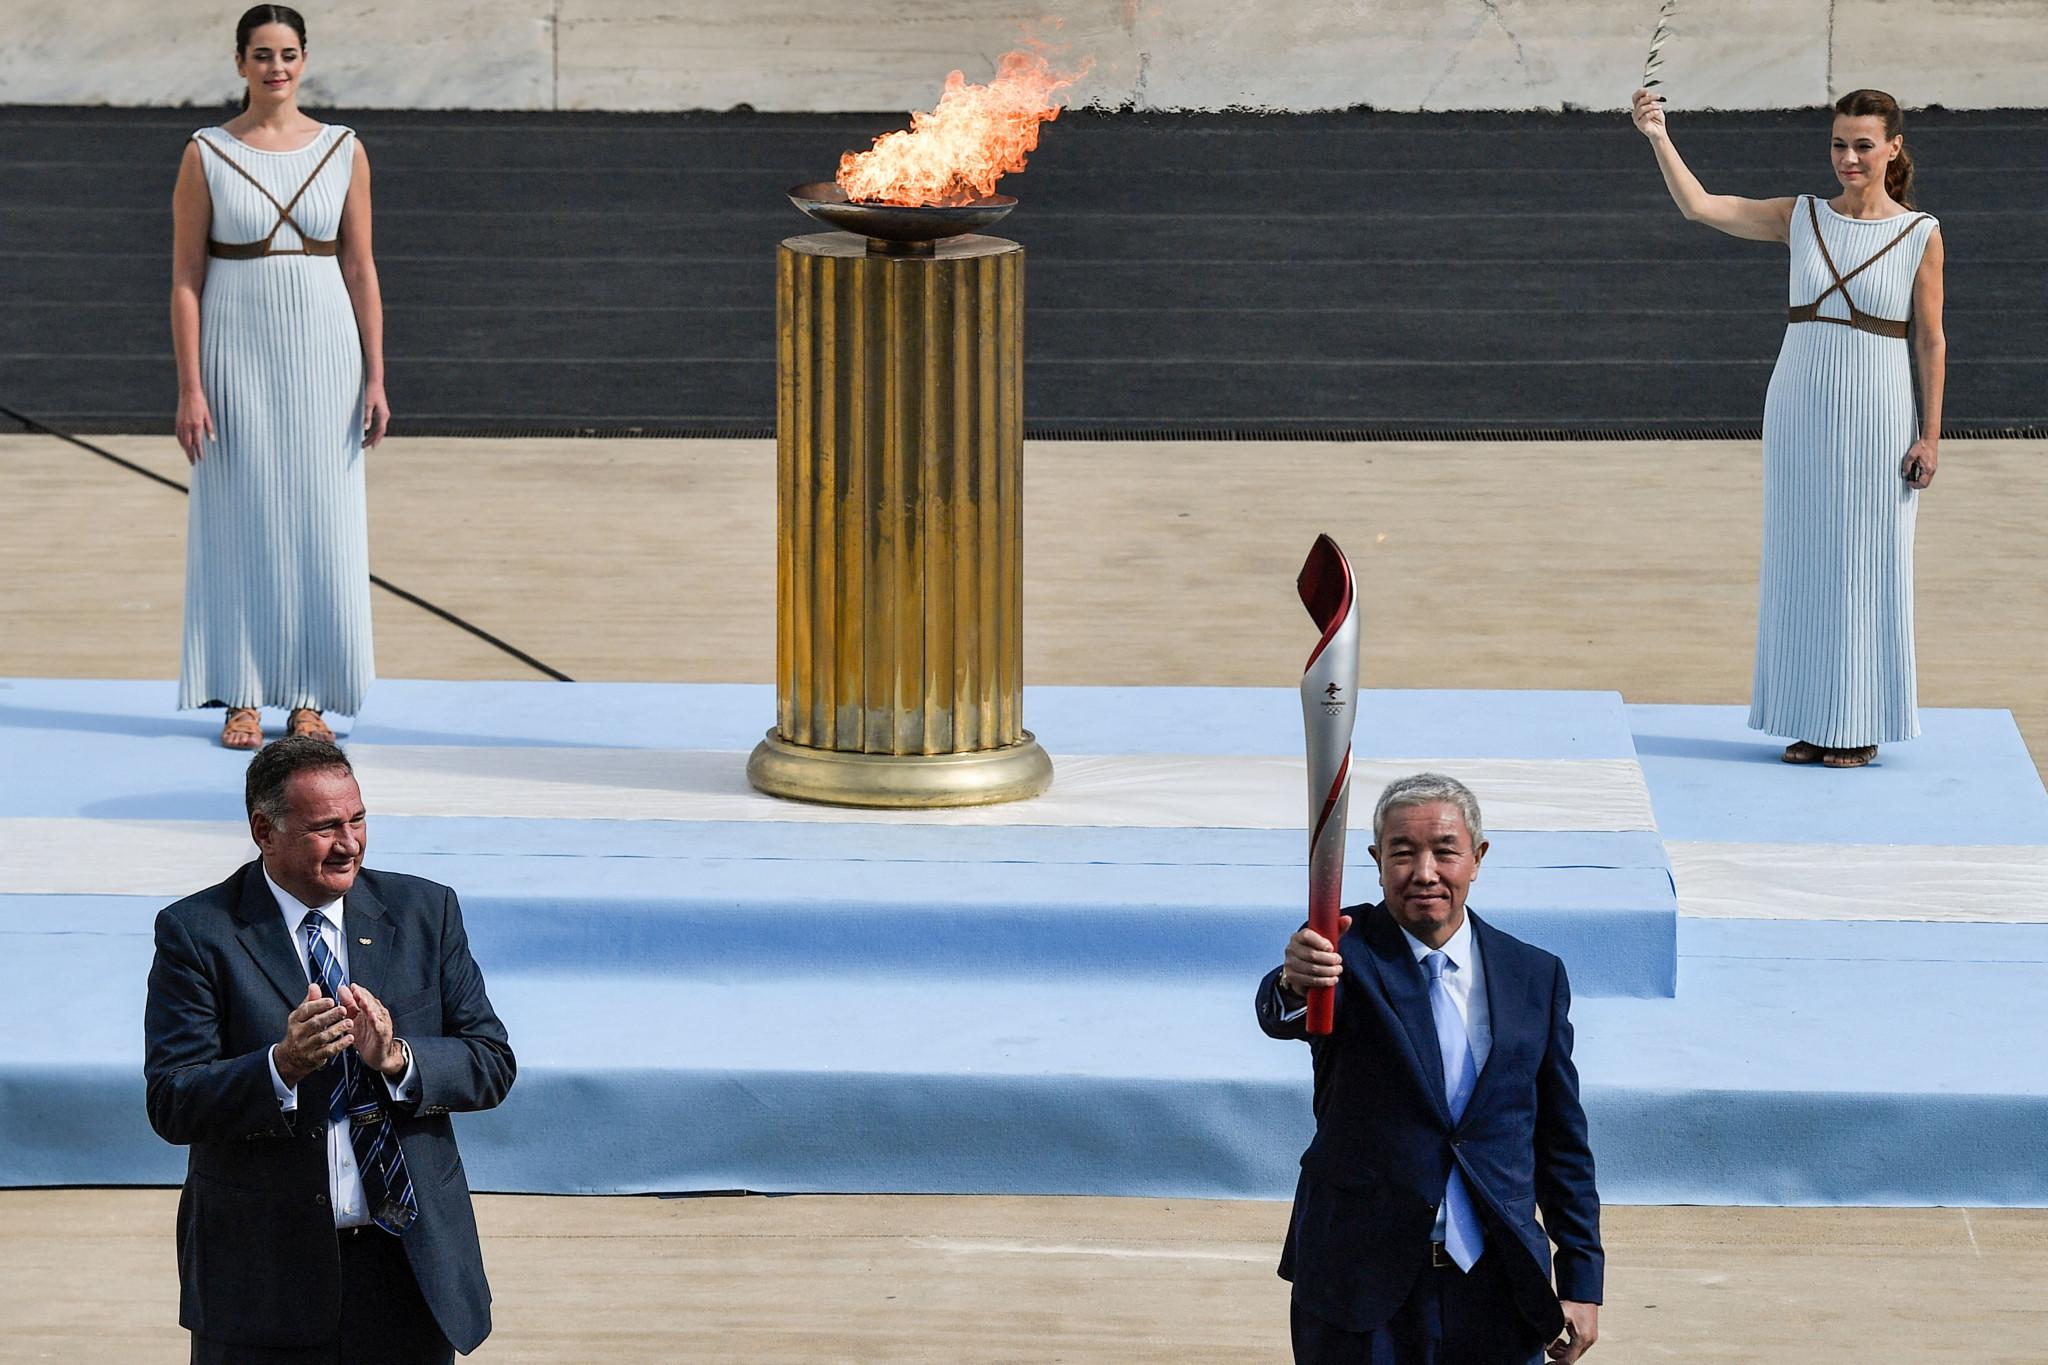 Beijing 2022 receives Olympic Flame in low-key handover